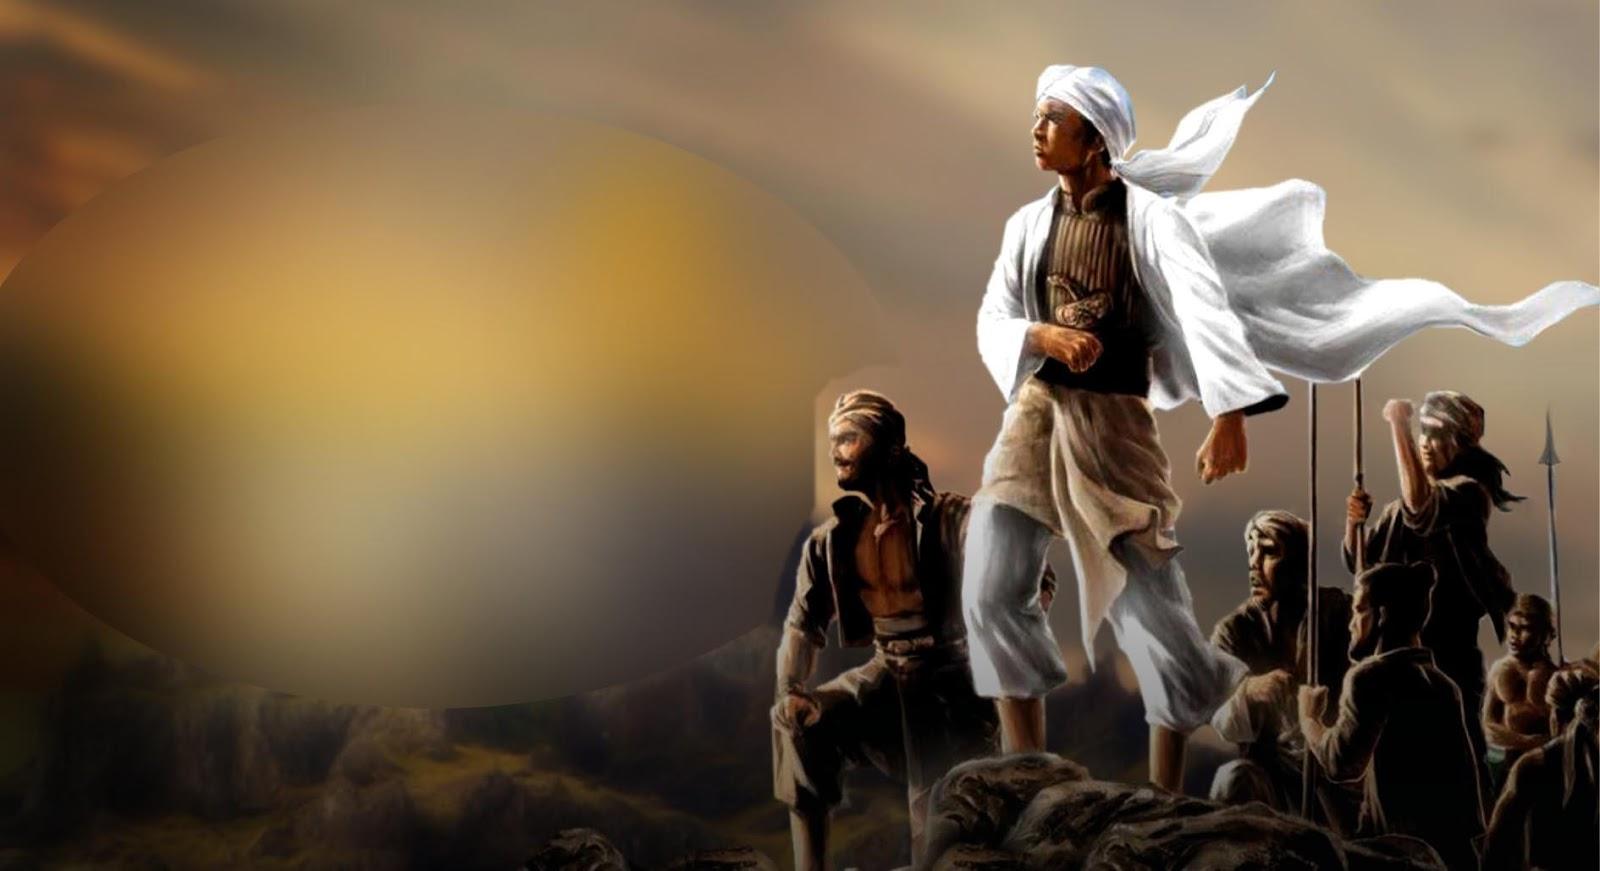 Ja'far Bin Abi Thalib, Kakak Sayydina Ali yang Mirip dengan Rasulullah